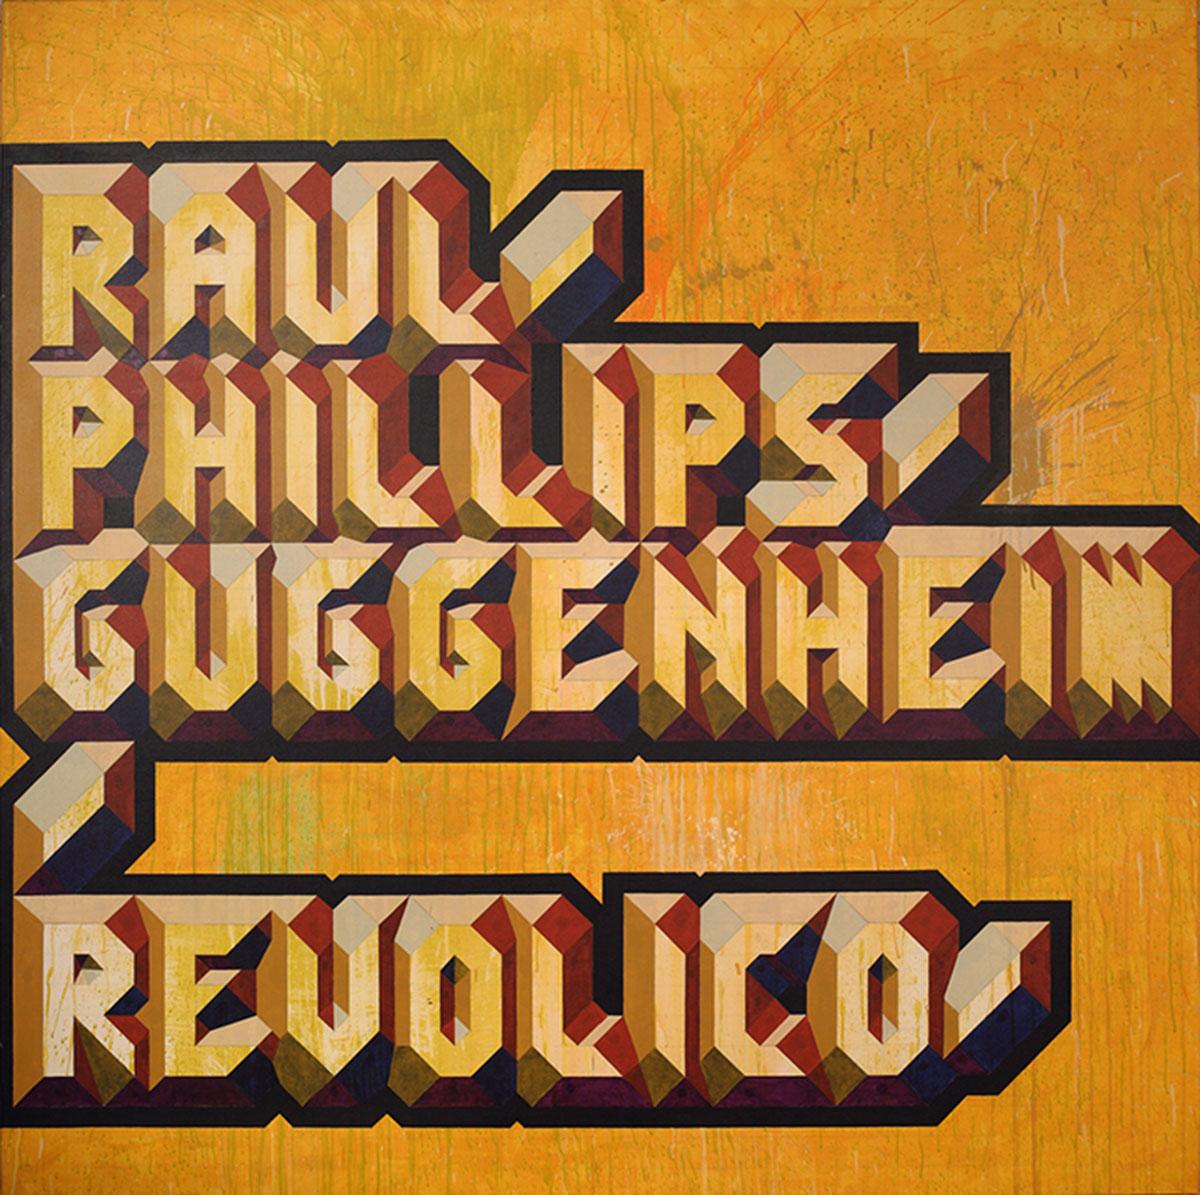 Glexis Novoa Revolico, 2014 Acrylic on canvas. Collection Pérez Art Museum Miami, gift of Jorge M. Pérez